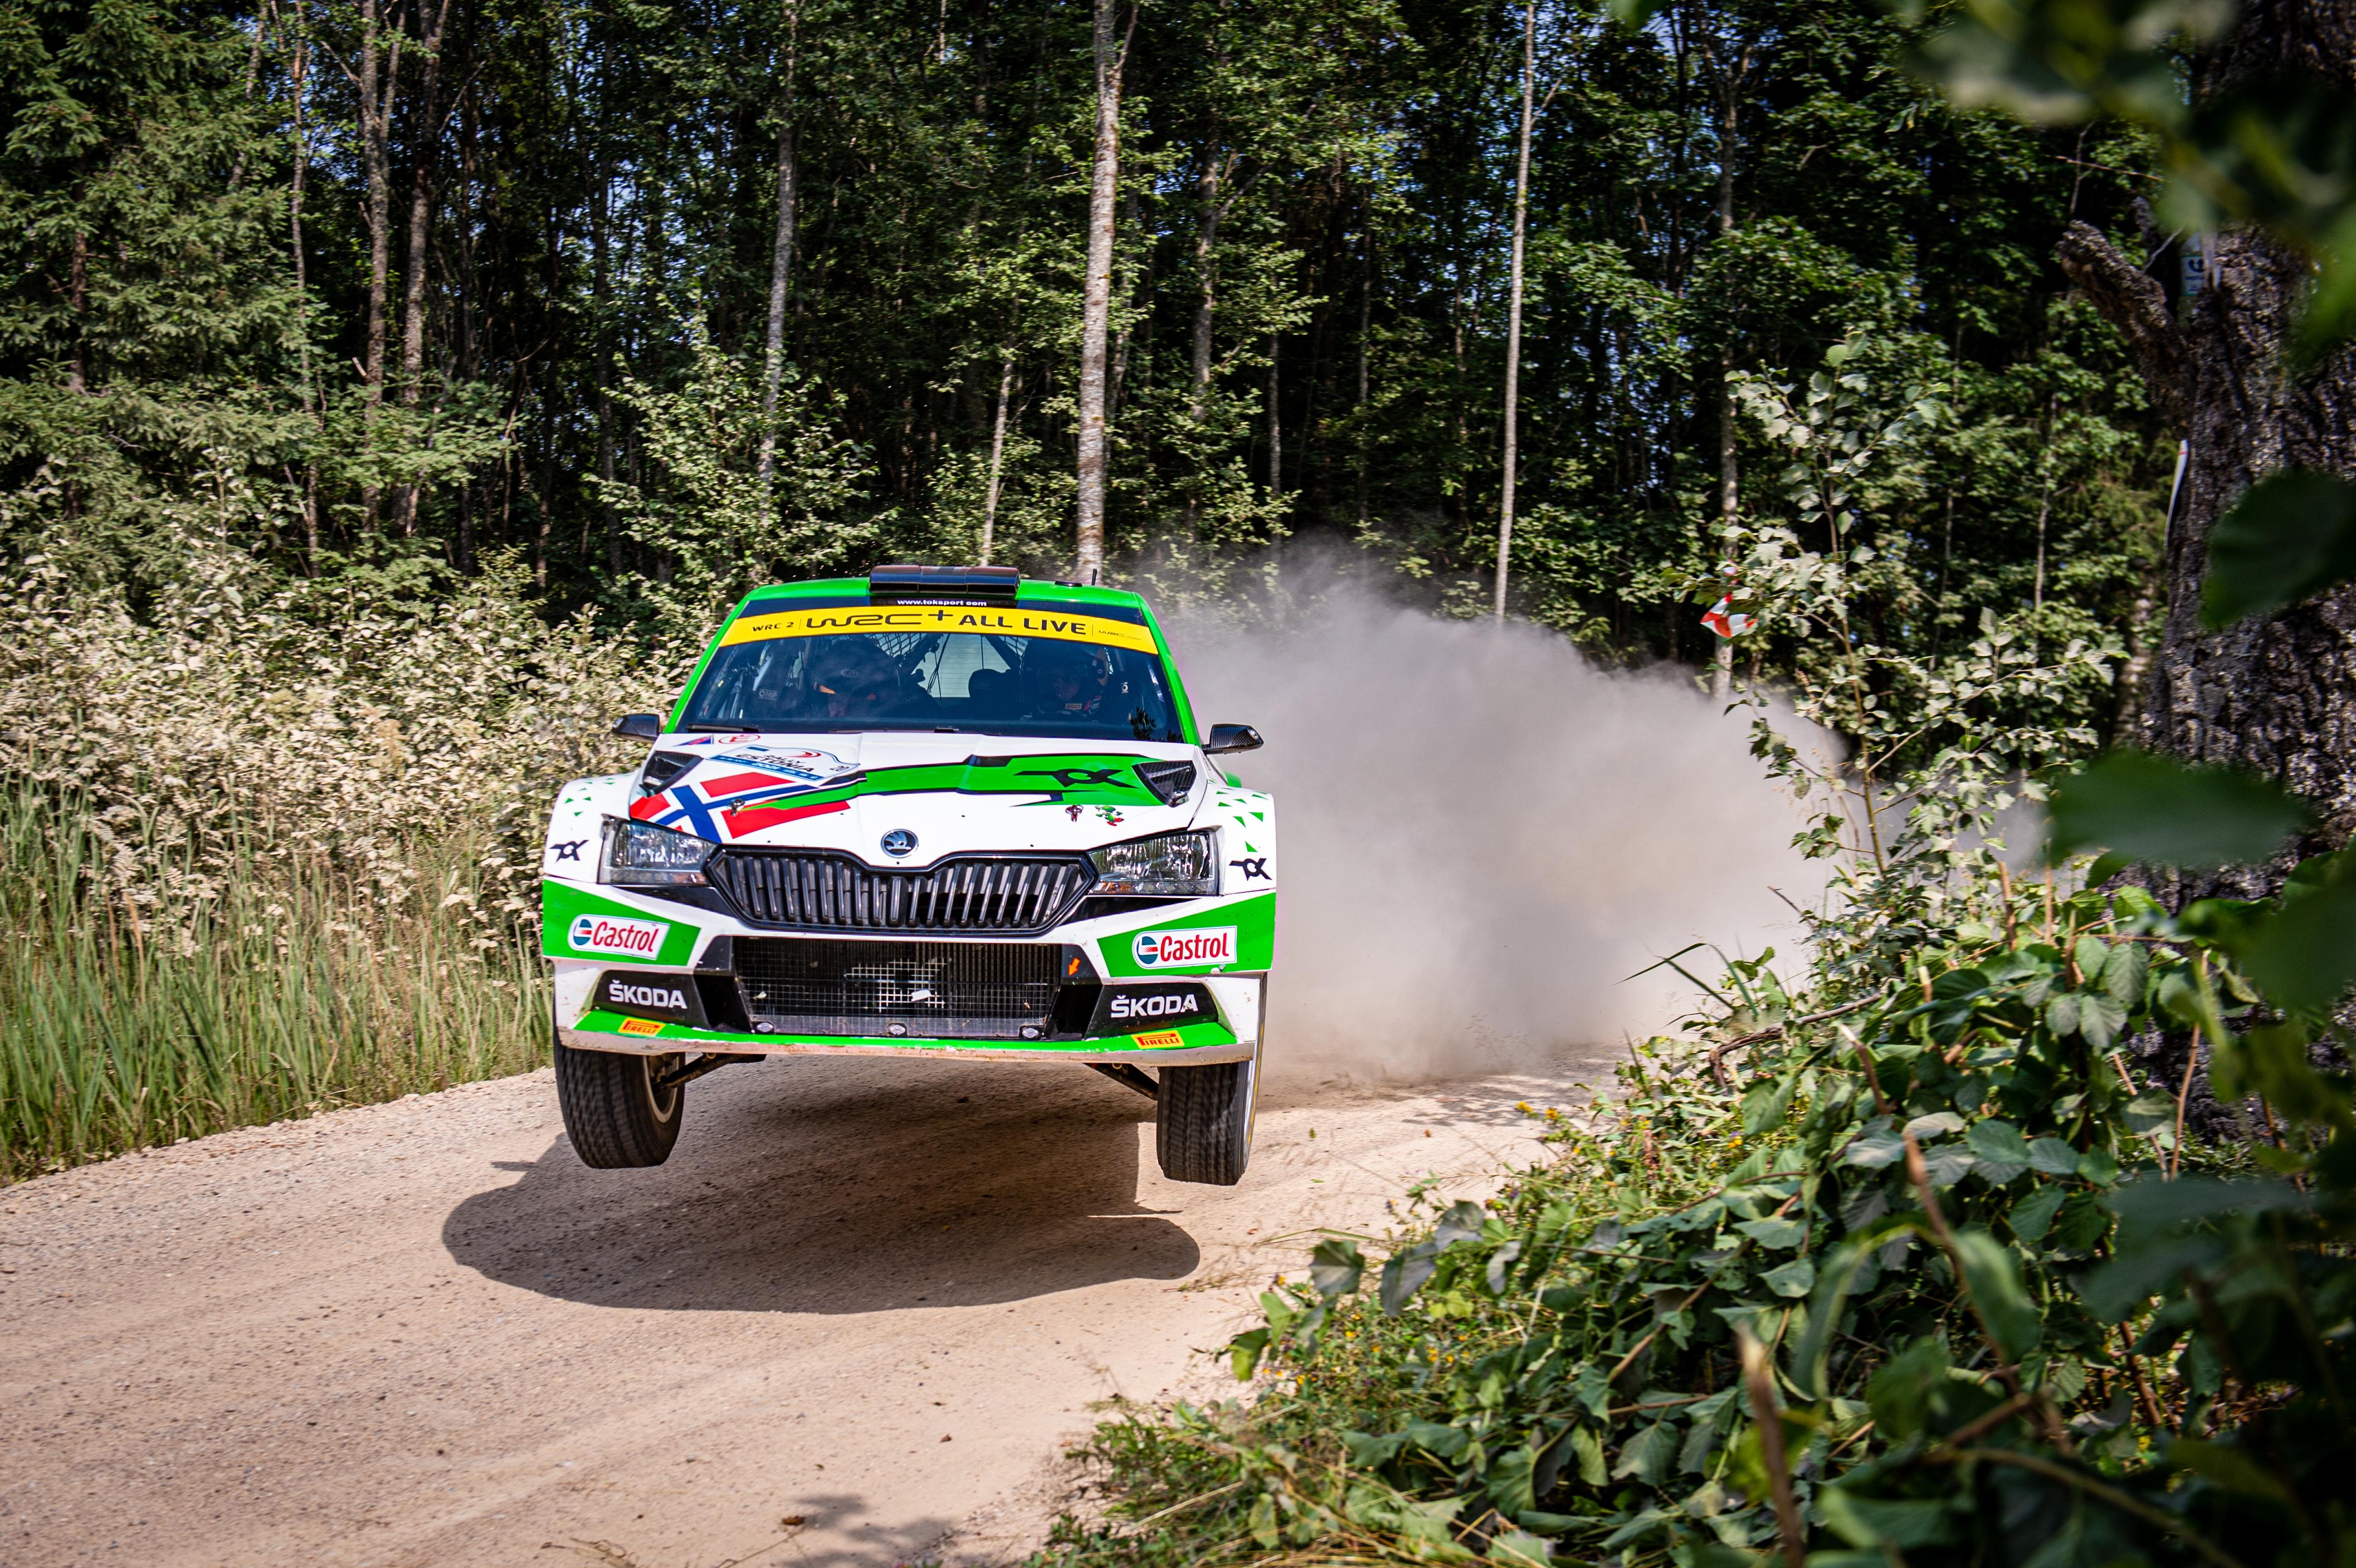 SKODA crews win WRC2 and WRC3 at Rally Estonia - Image 8